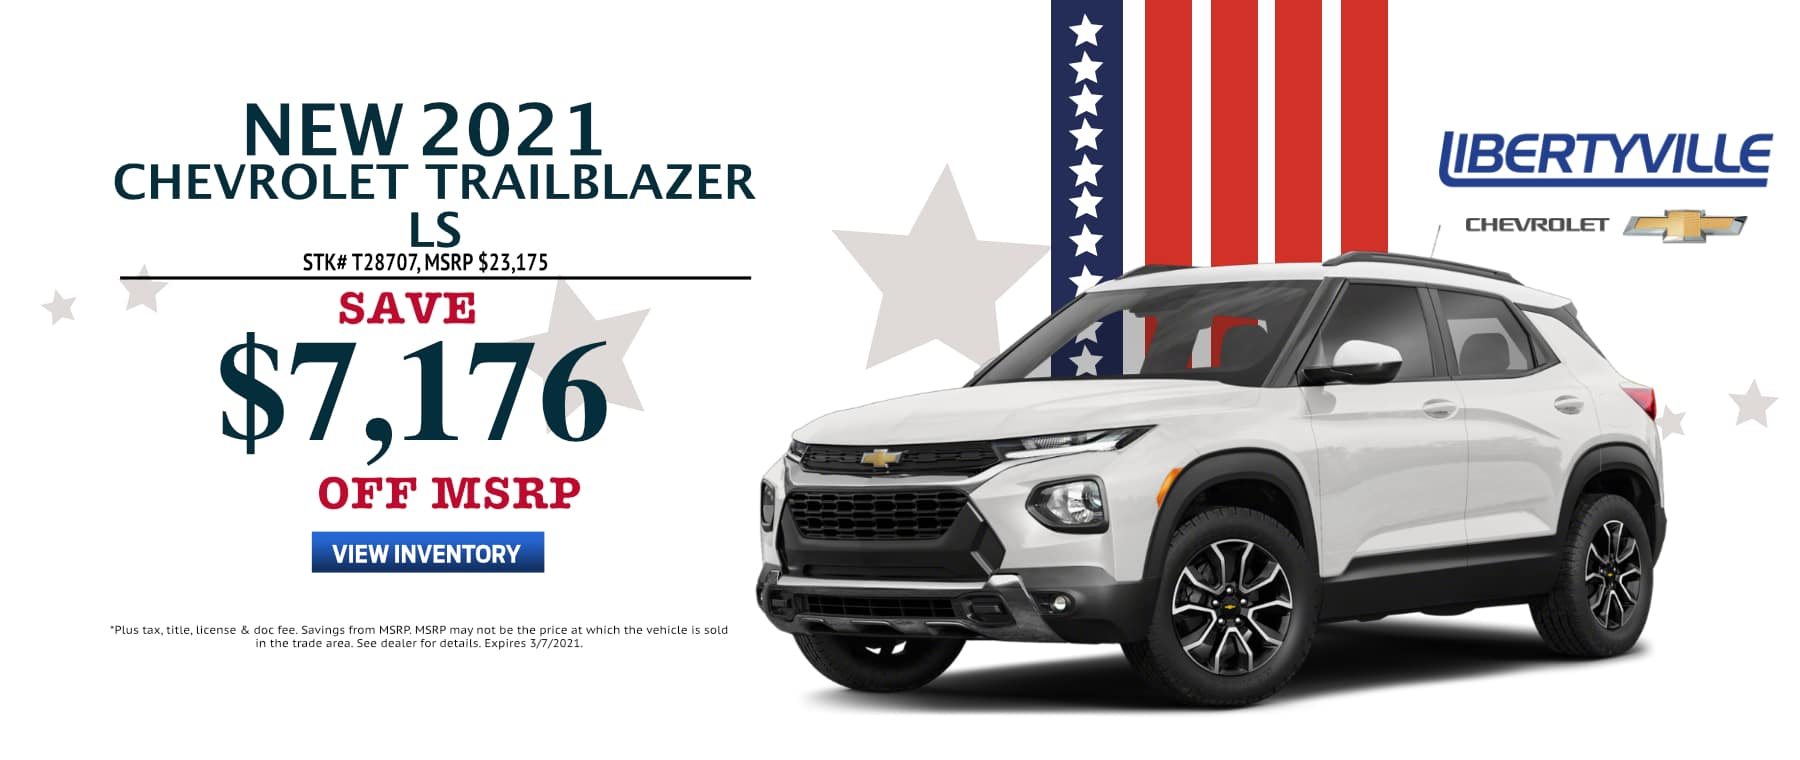 February_2021_TRAILBLAZER_Libertyville_Chevrolet